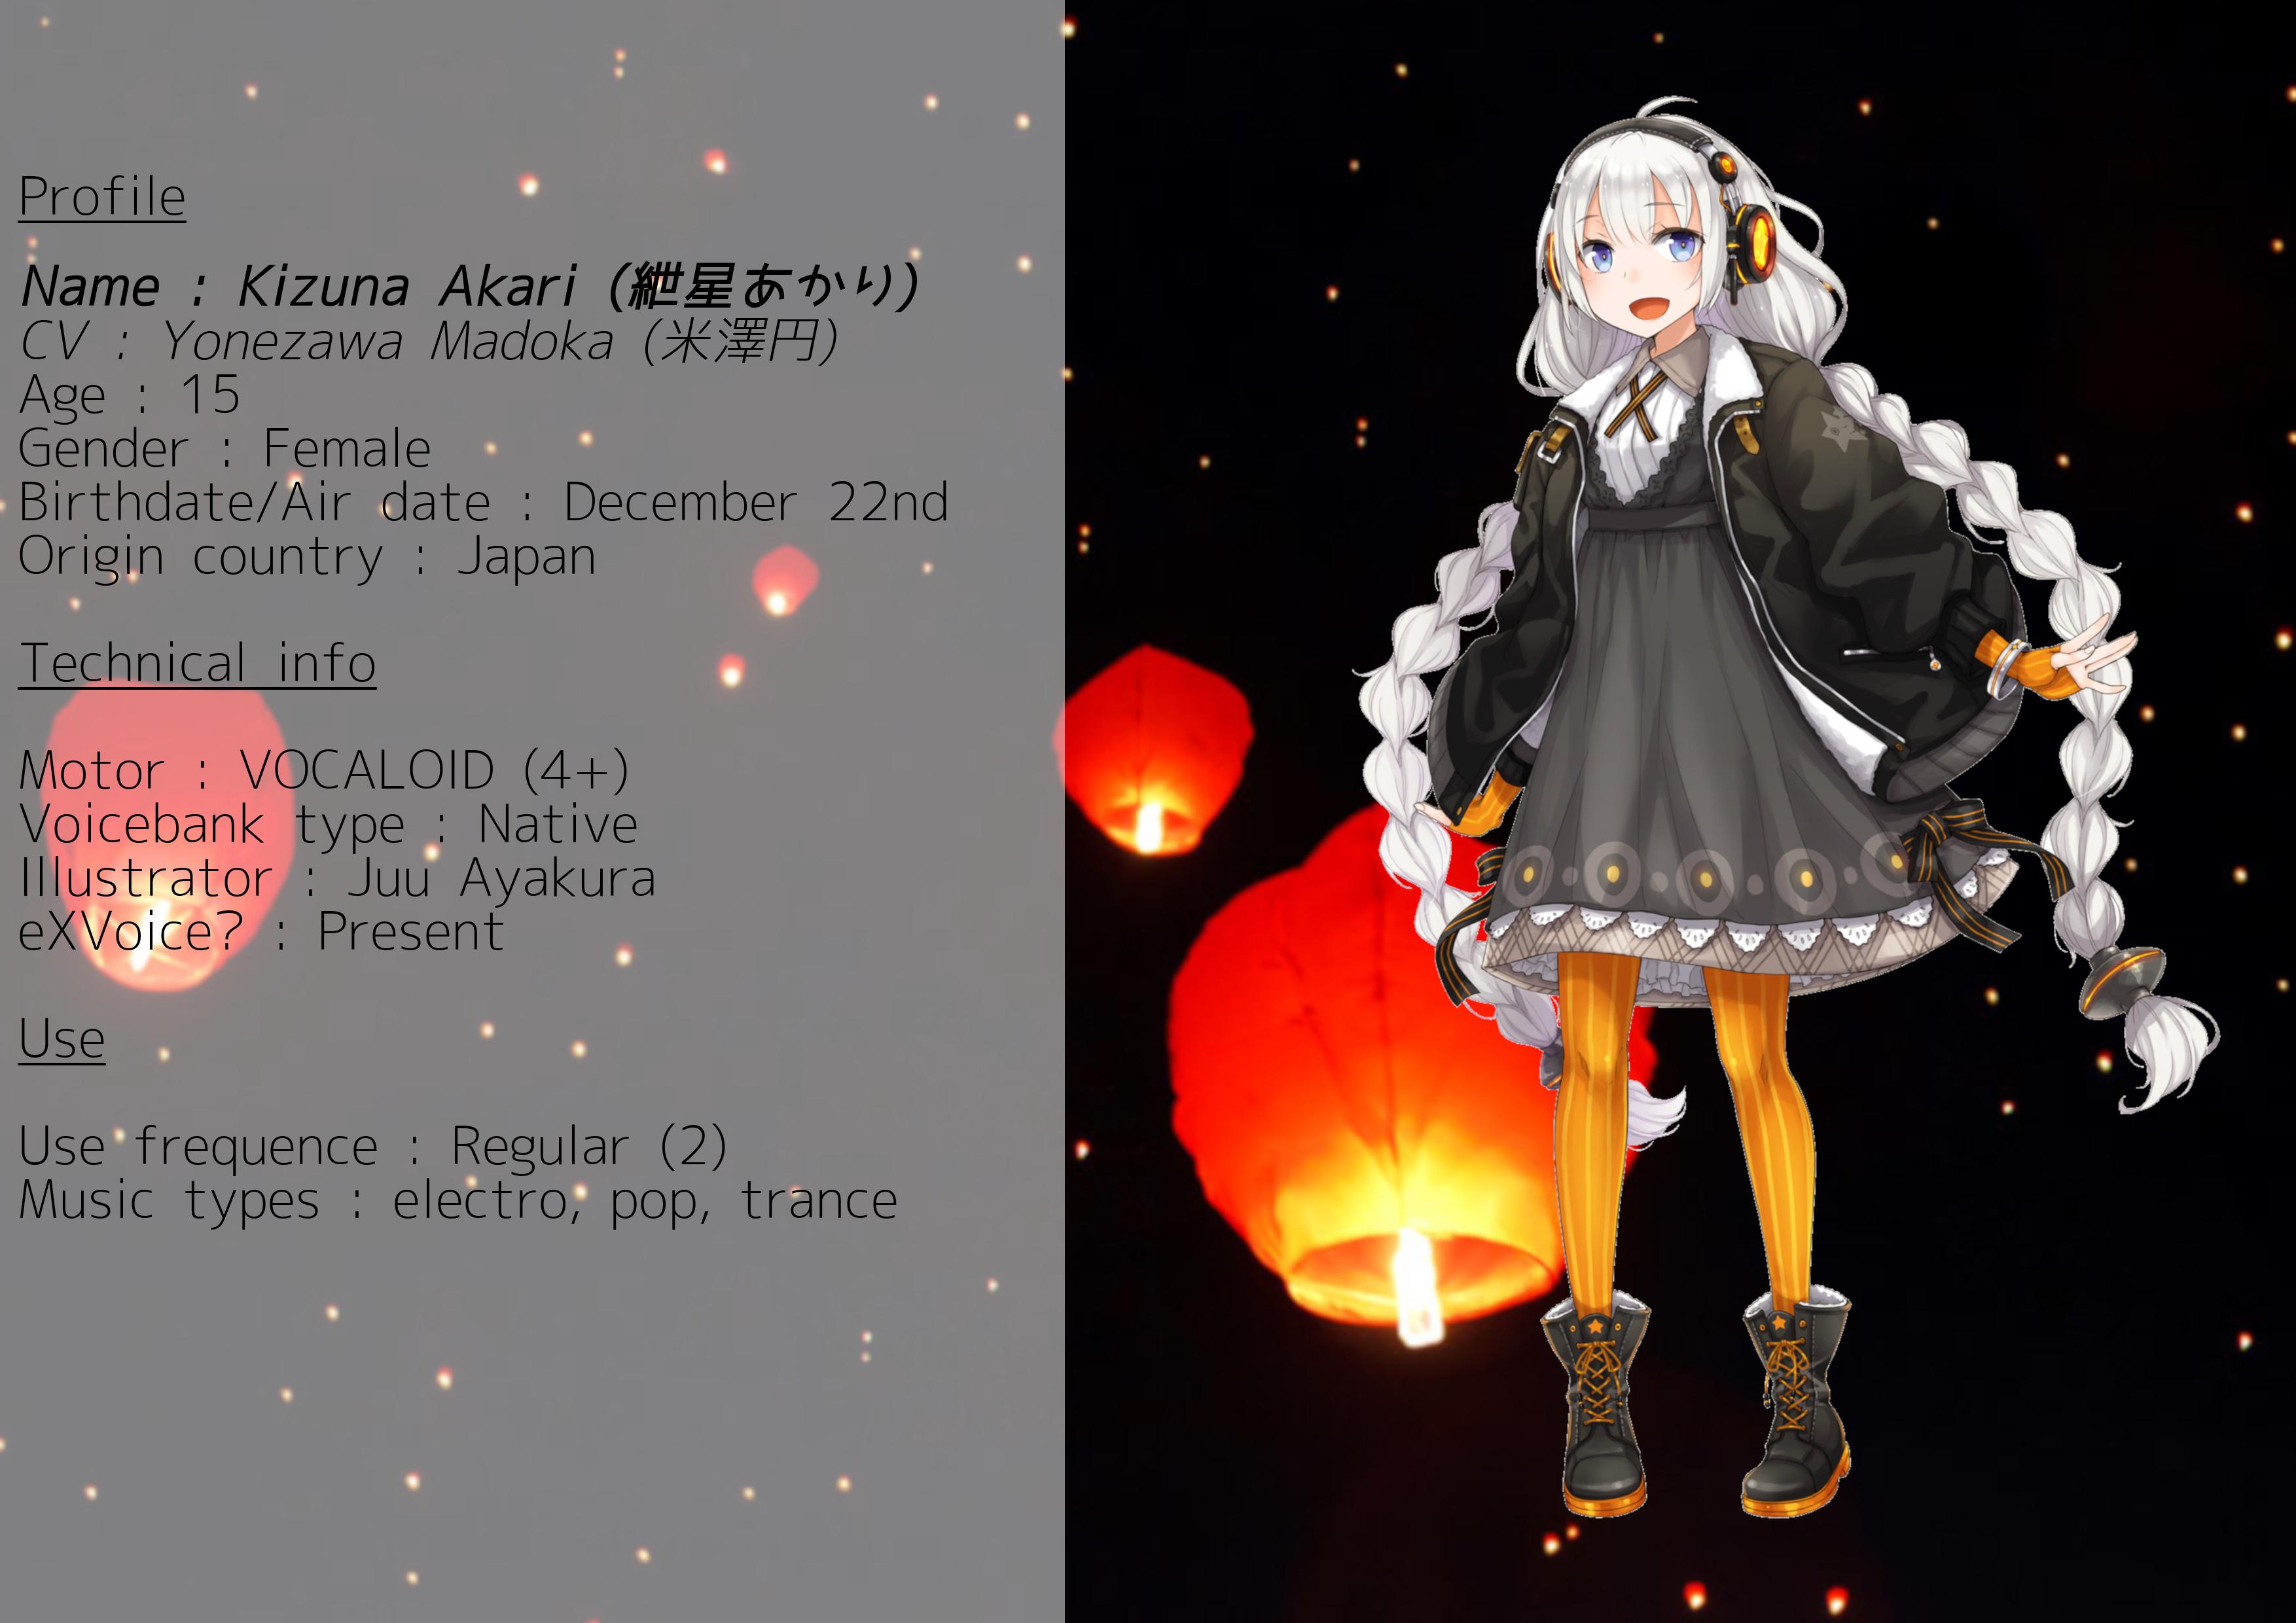 Akari Kizuna / 紲星あかり